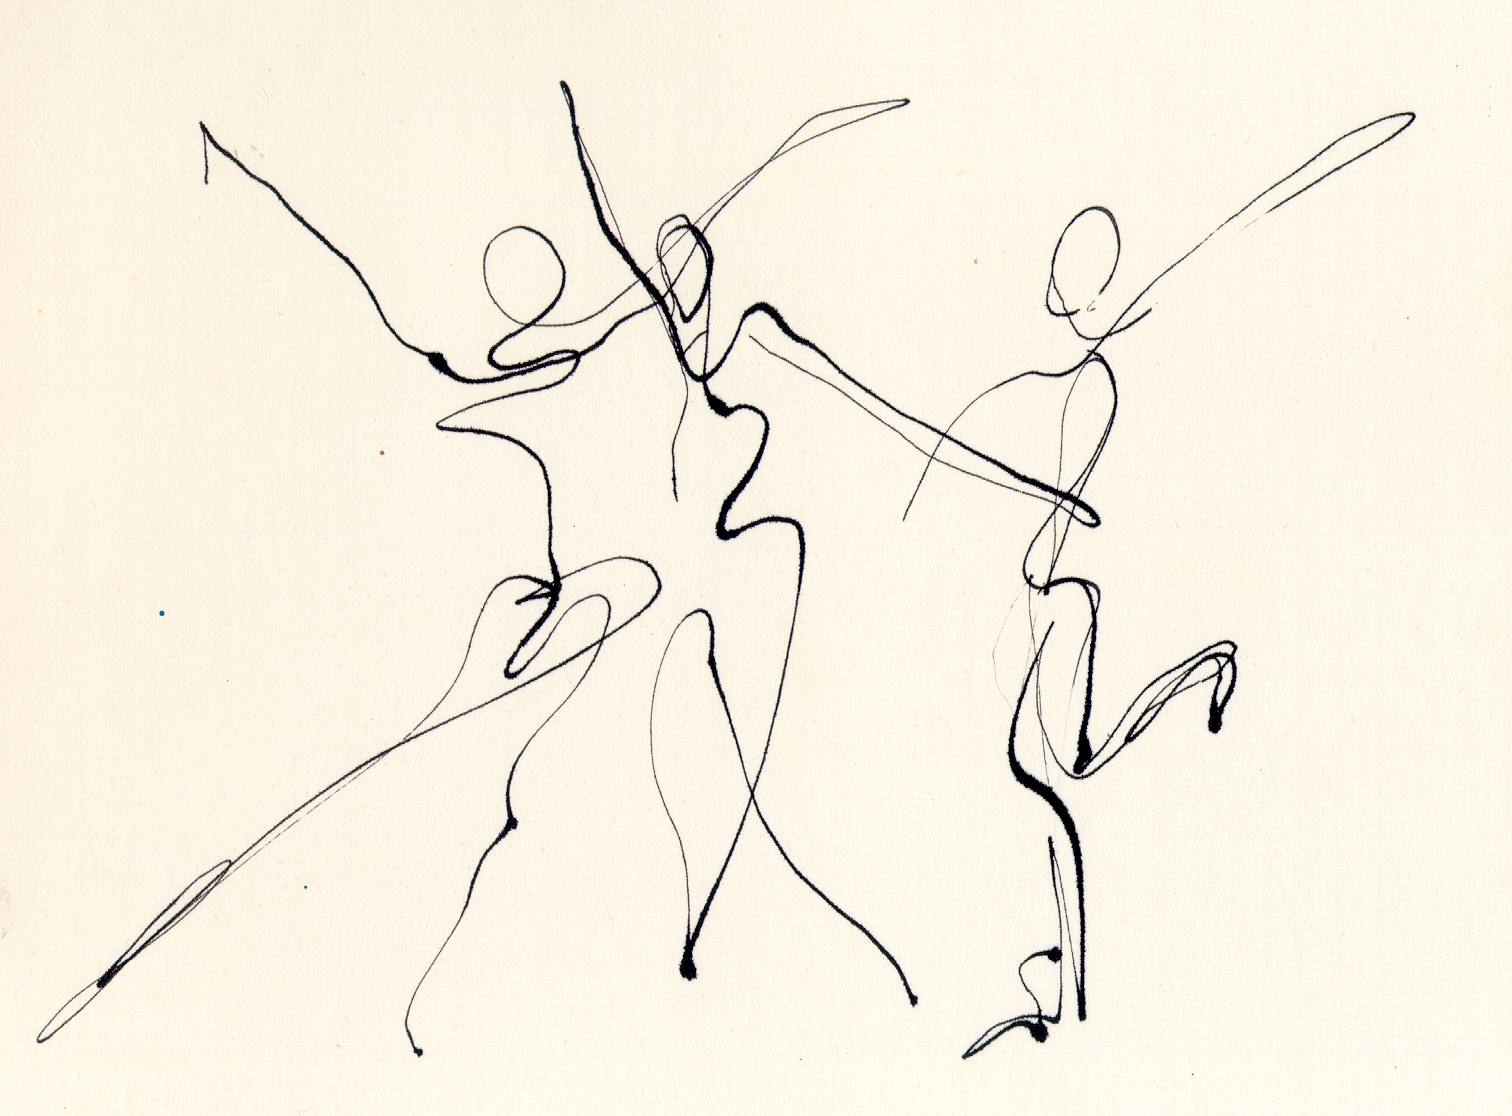 1512x1116 3 Dancers Line Drawing Chris Carter Artist Dip Pen Ink Web Third